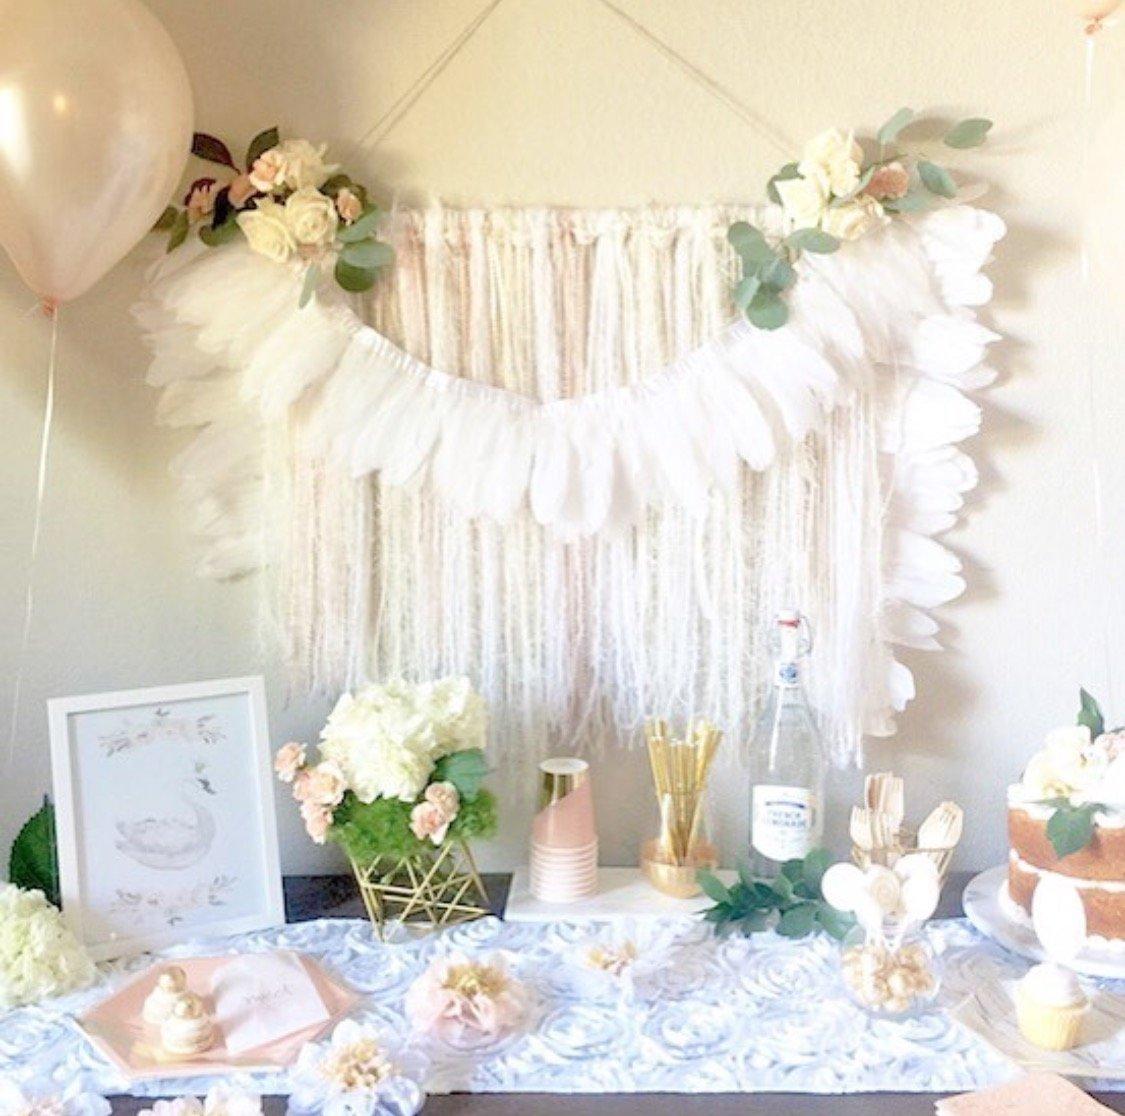 10 Wonderful All White Birthday Party Ideas gorgeous all white boho swan party swan parties pinterest 2020